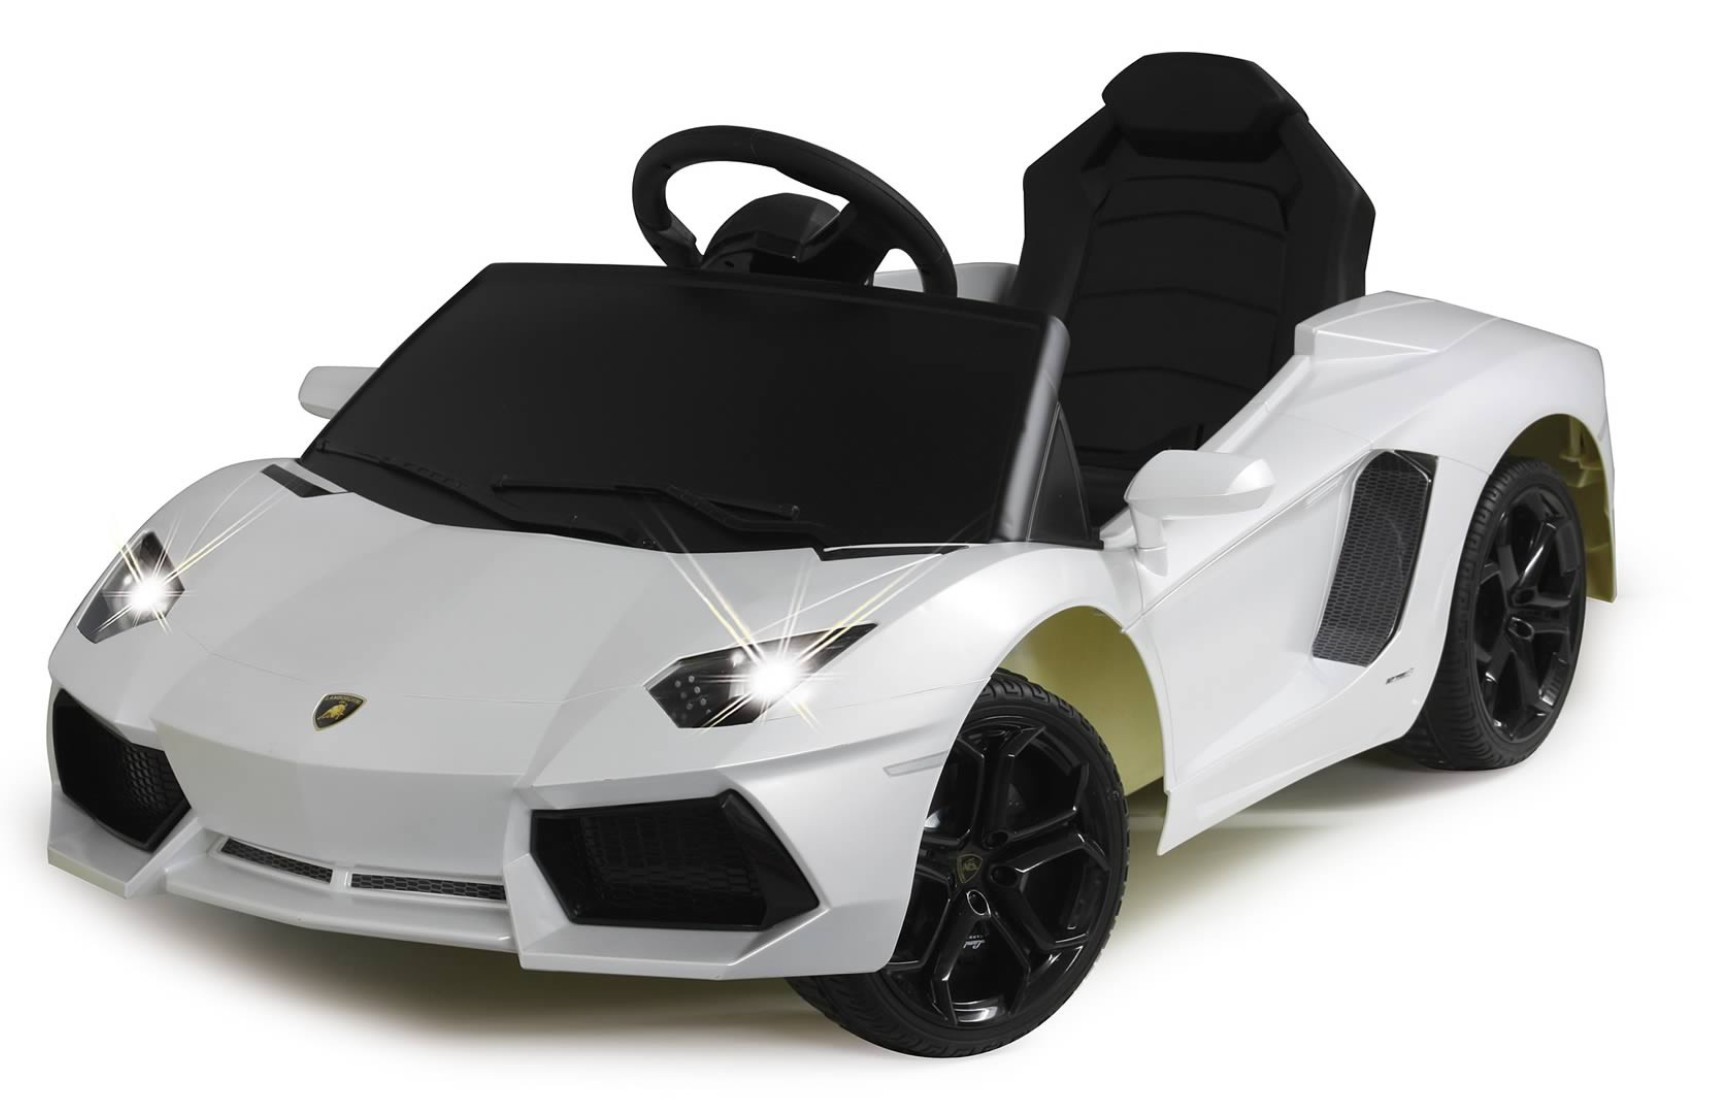 voiture lectrique lamborghini aventador blanche 2x25w 12v. Black Bedroom Furniture Sets. Home Design Ideas